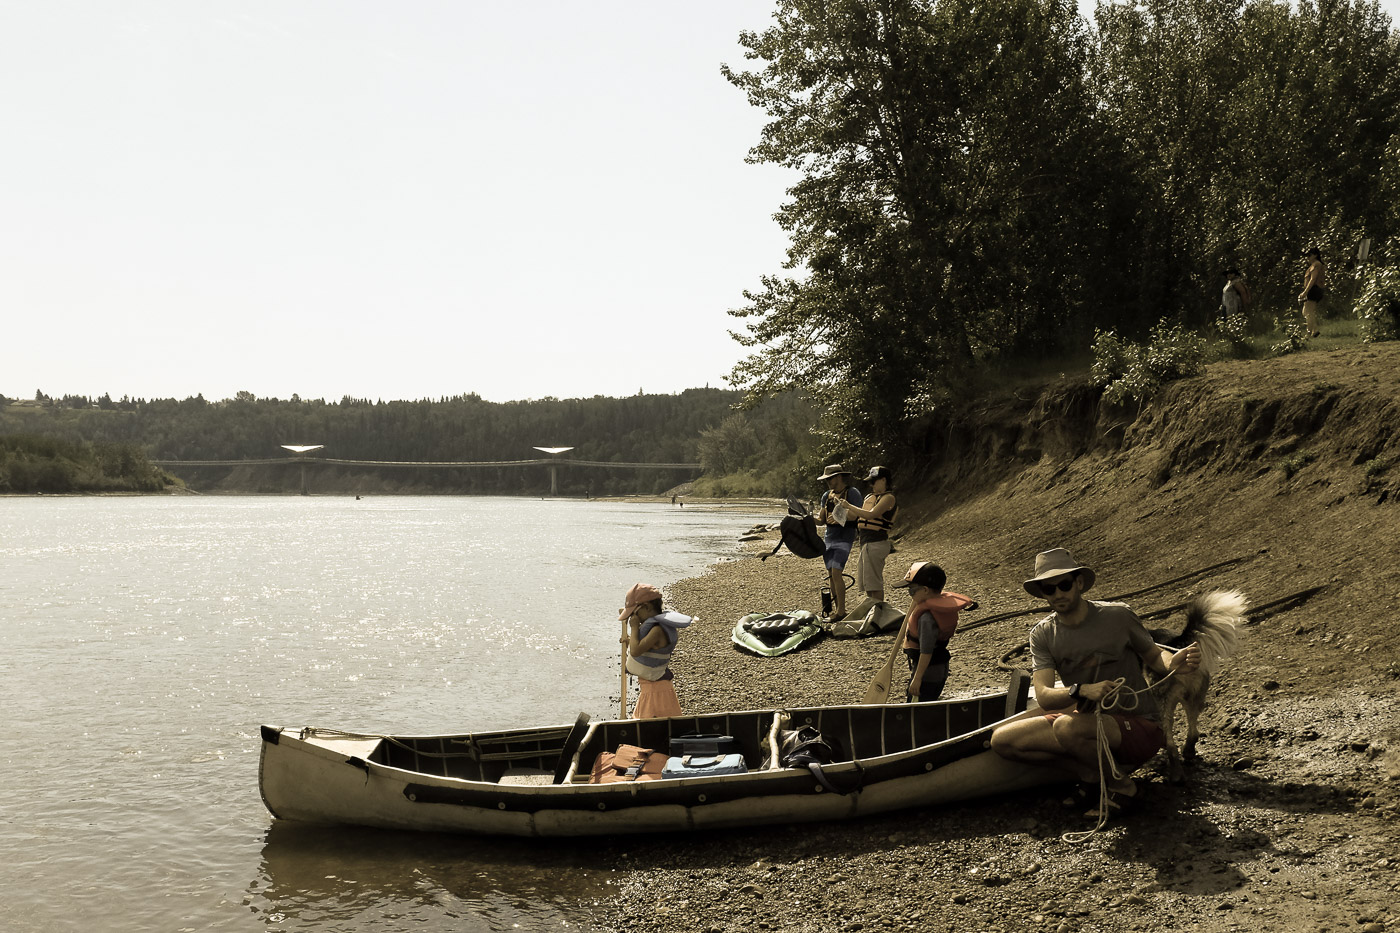 hb images - river edge - 3_